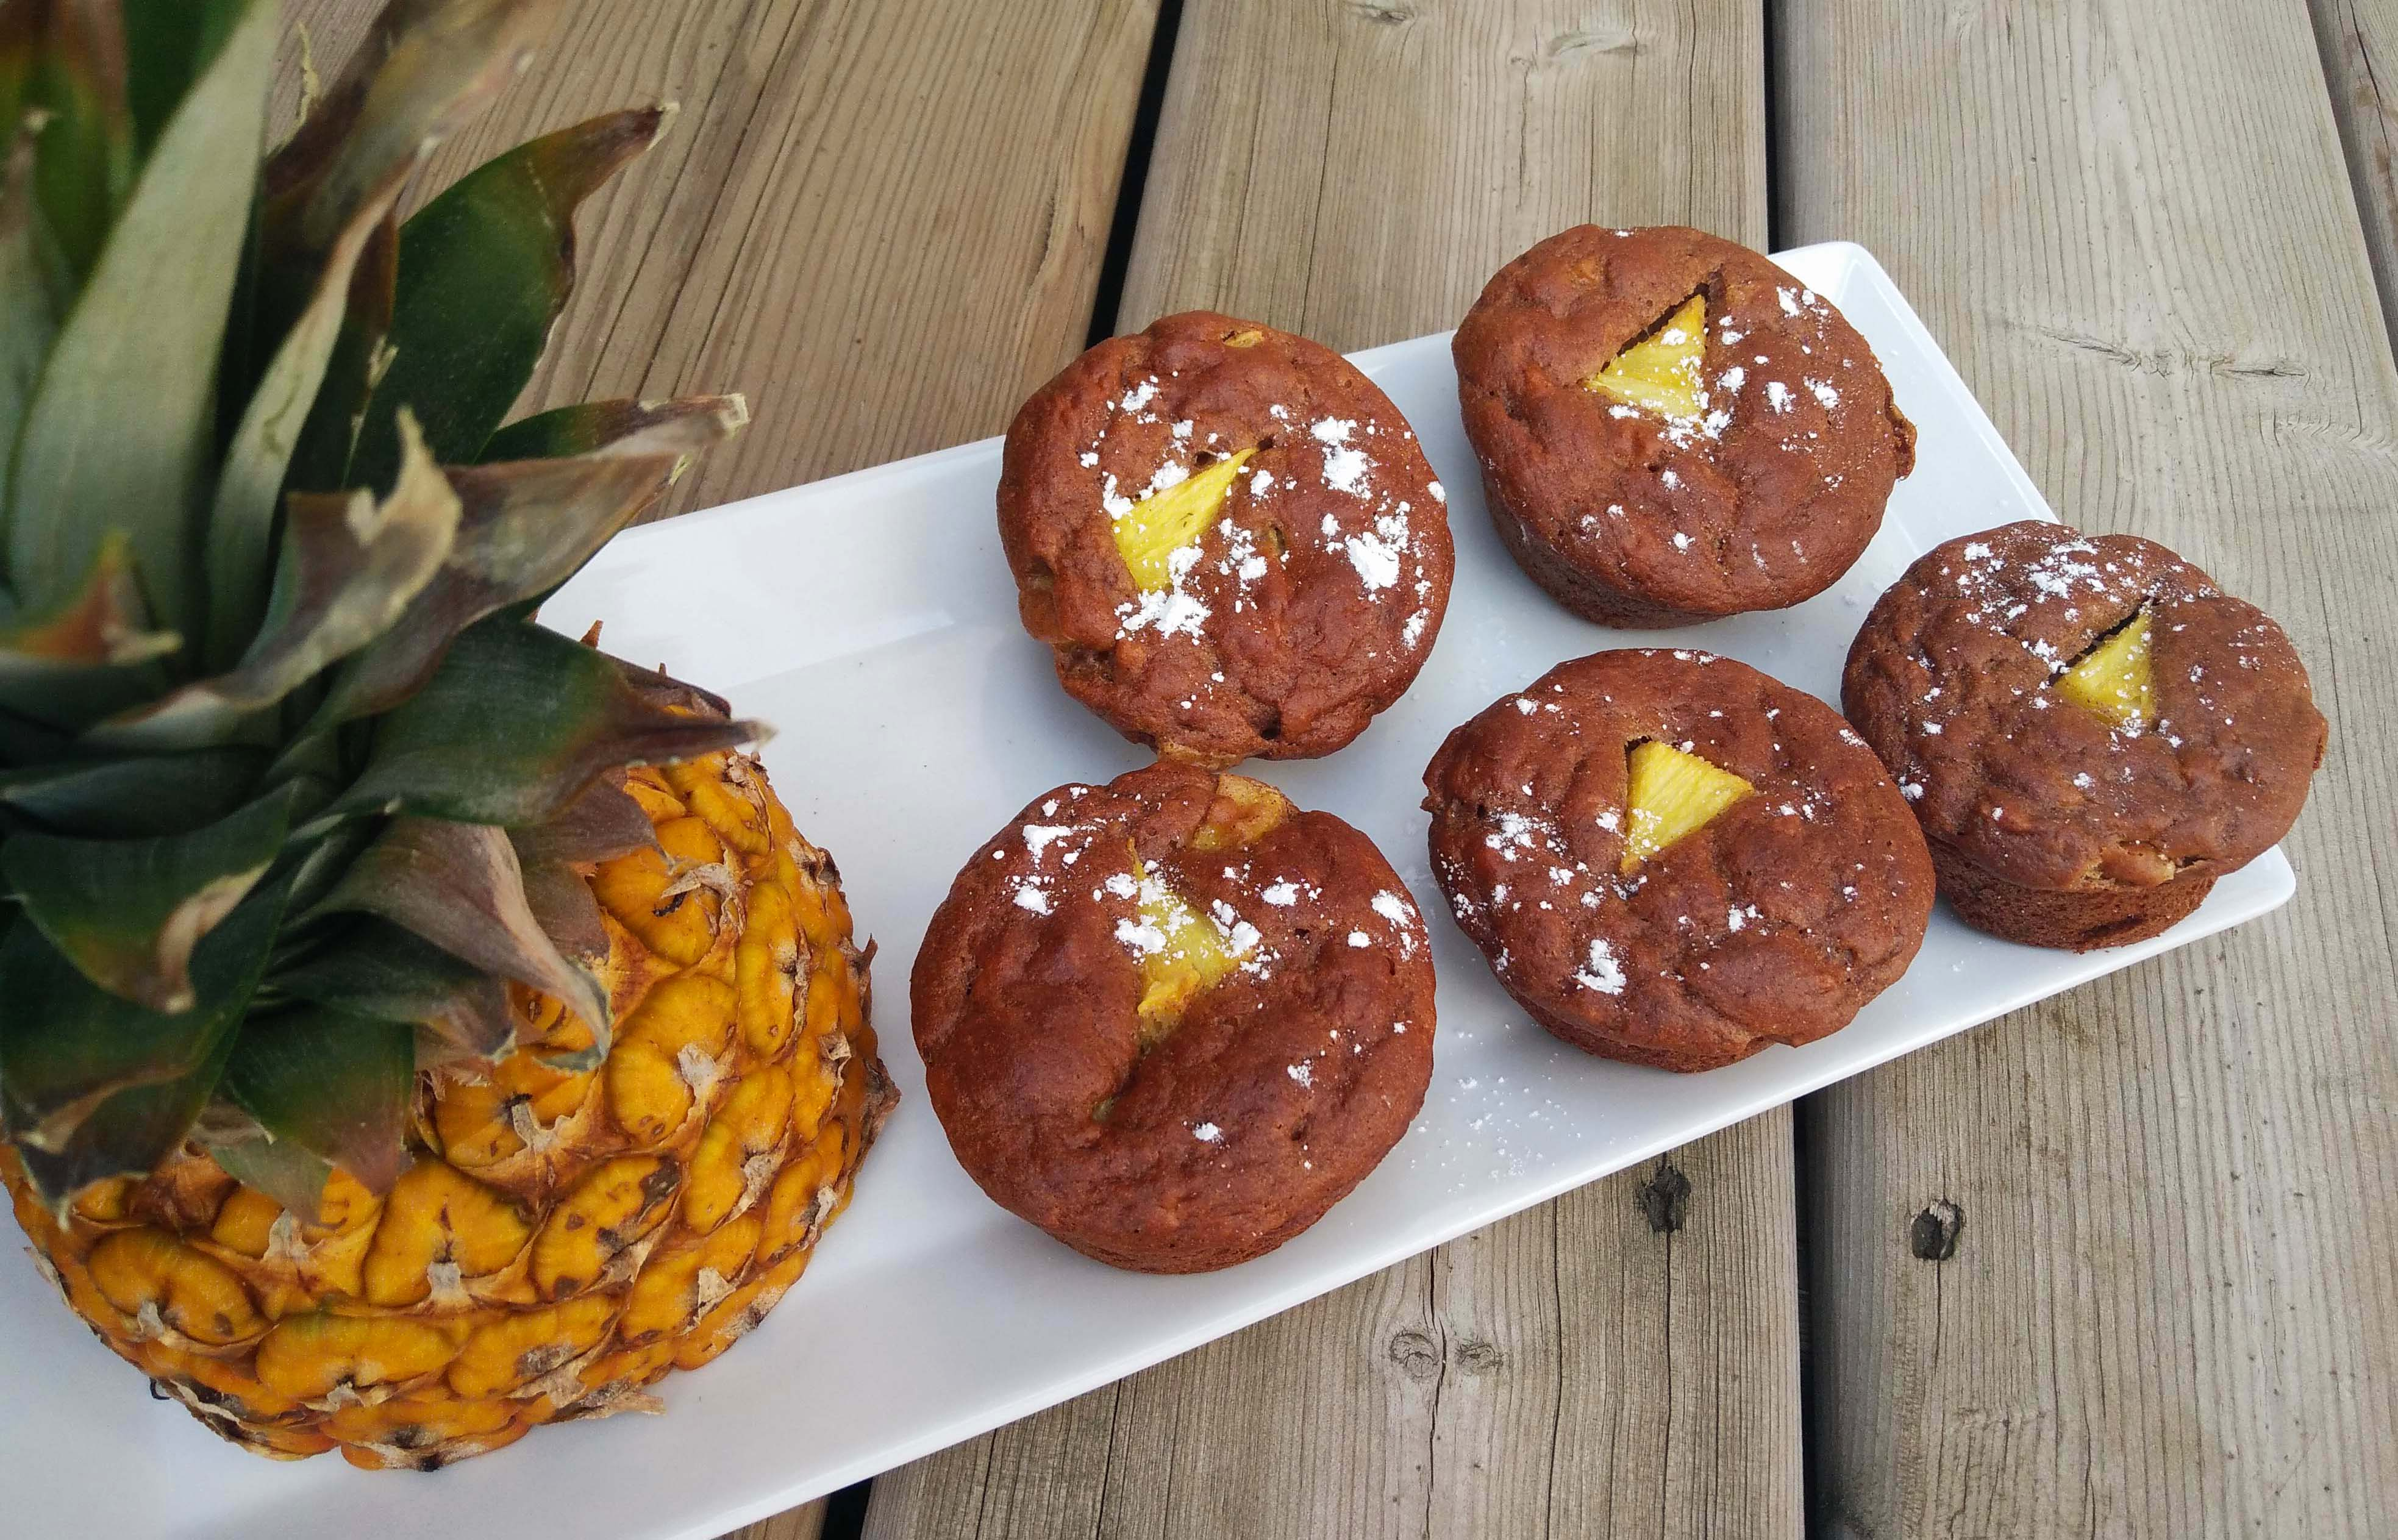 whole-wheat-pineapple-banana-muffins-19a